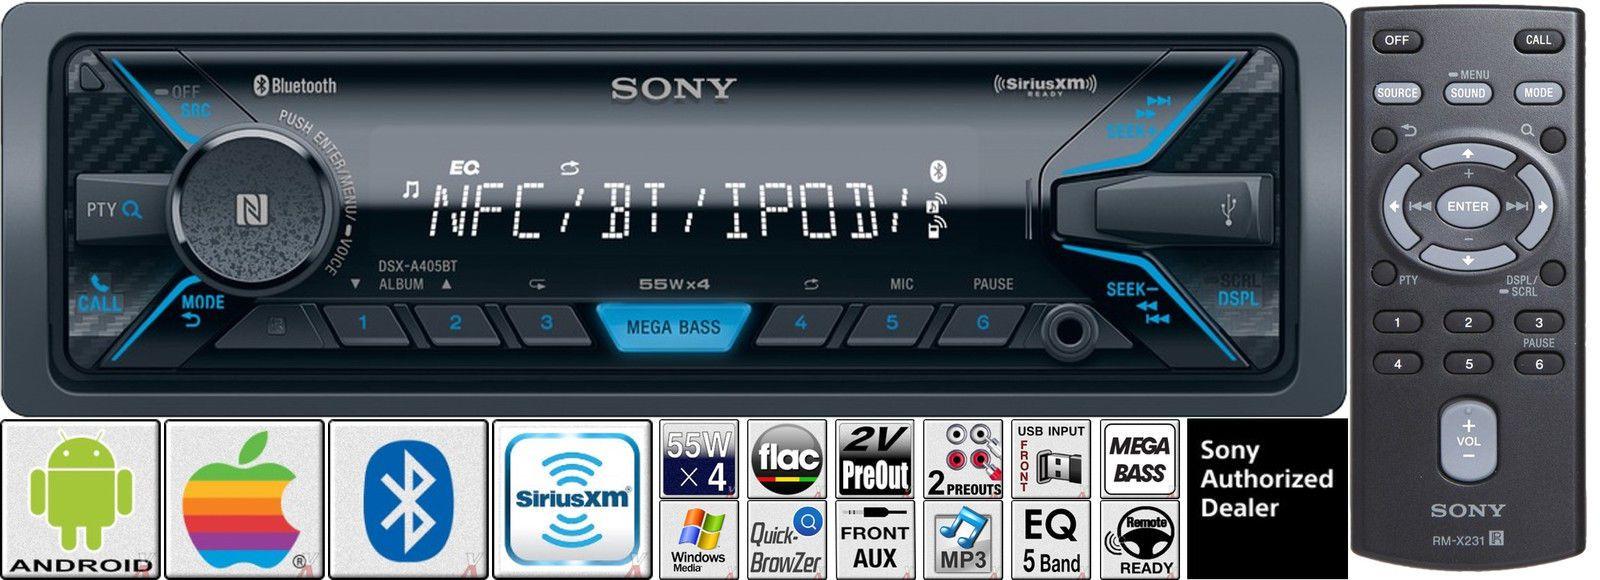 Sony Car Radio Stereo Bluetooth USB AUX Apple Android Pandora